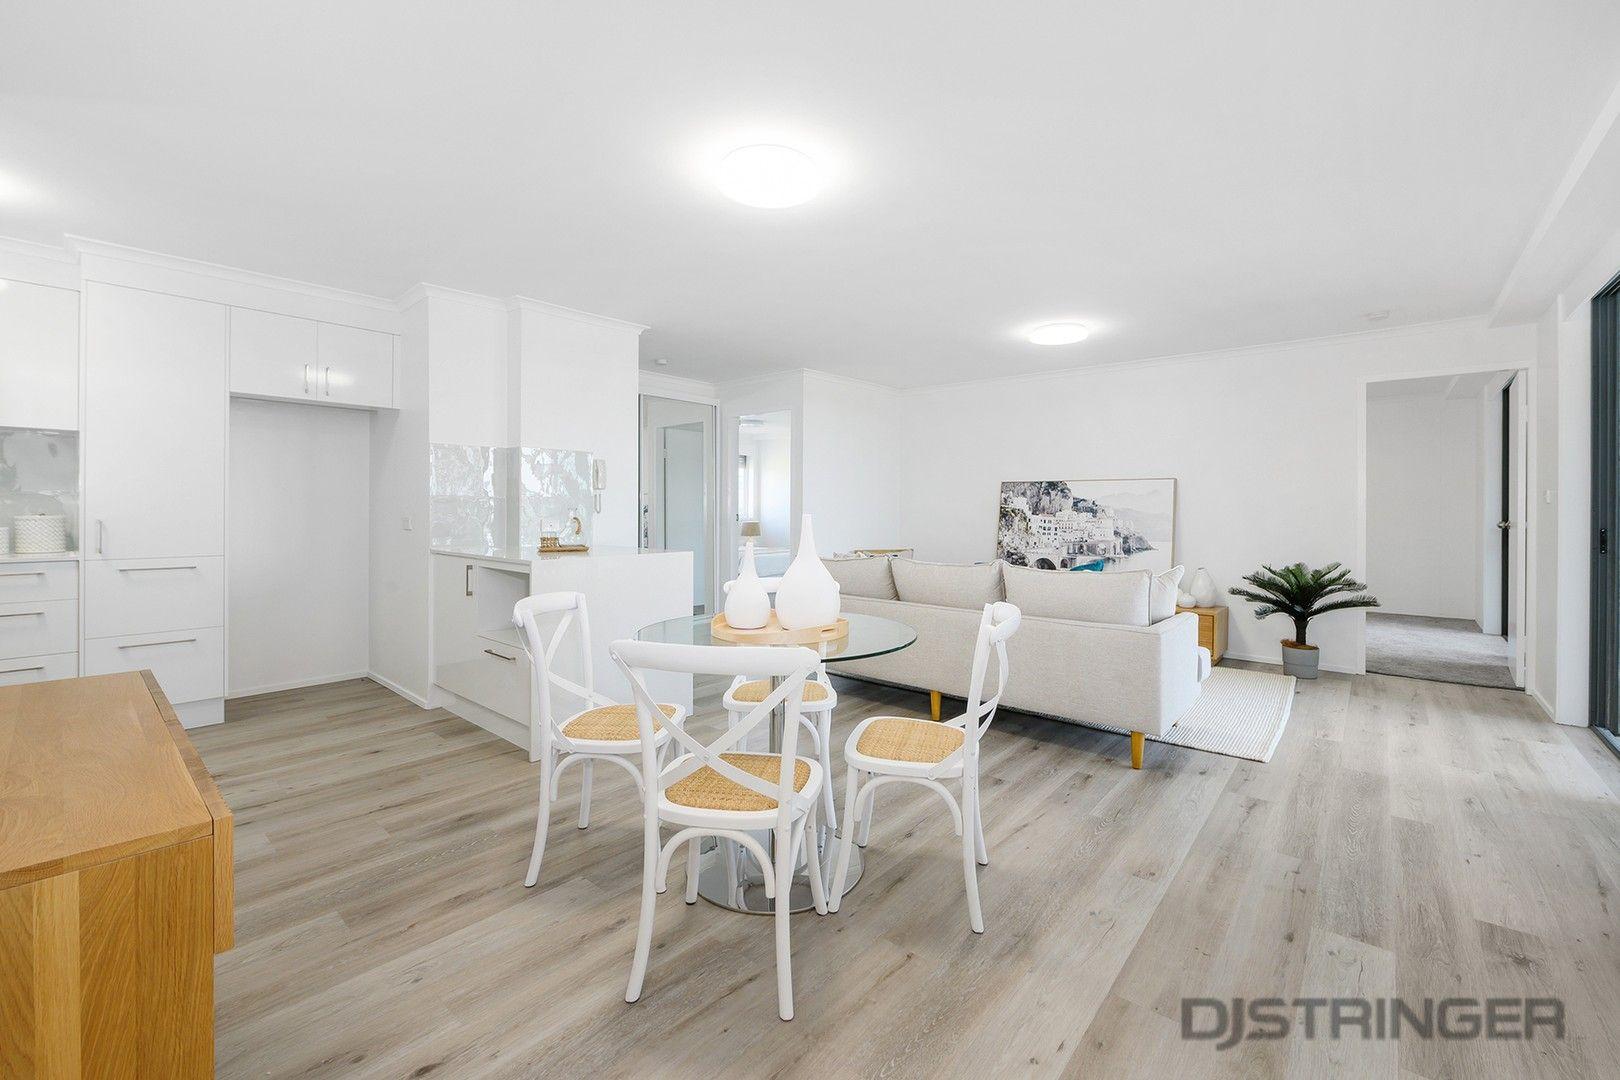 20/32-34 Musgrave Street, Kirra QLD 4225, Image 0